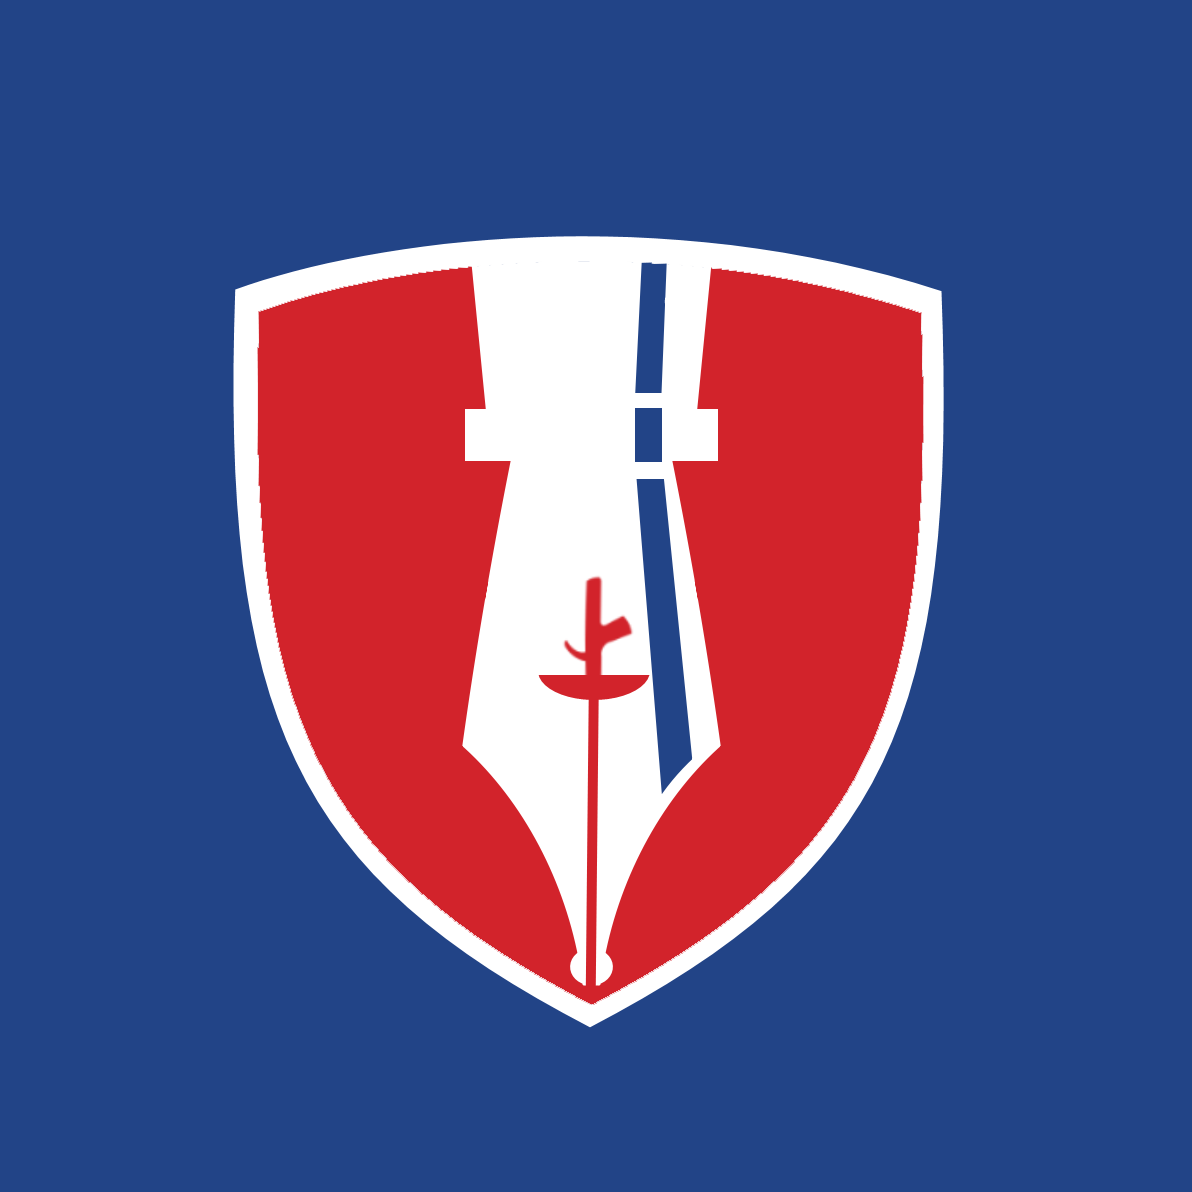 aafa role play fencing logo 2-1